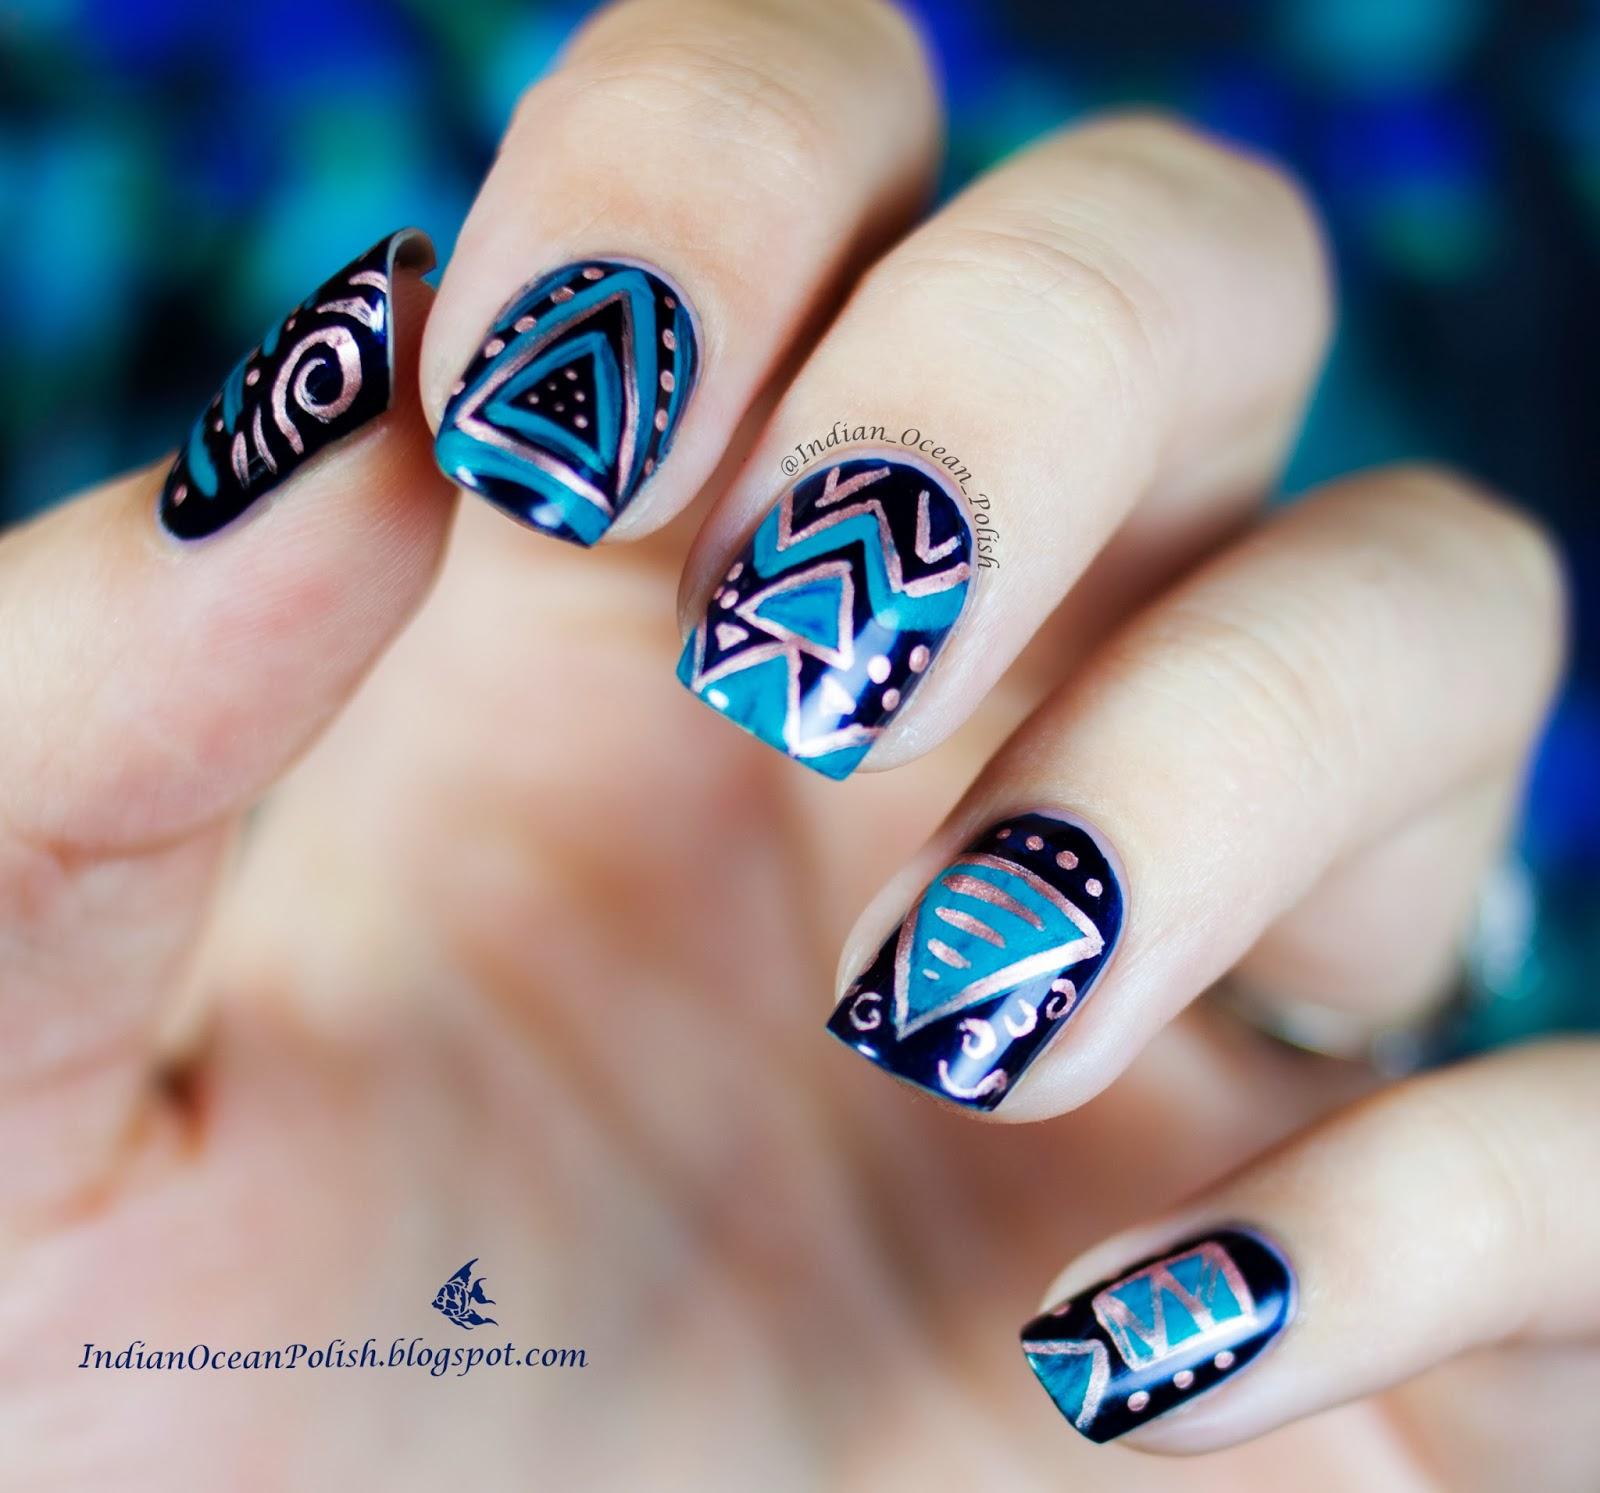 35 Slaying Triangle Nail Art | Nail Design Ideaz